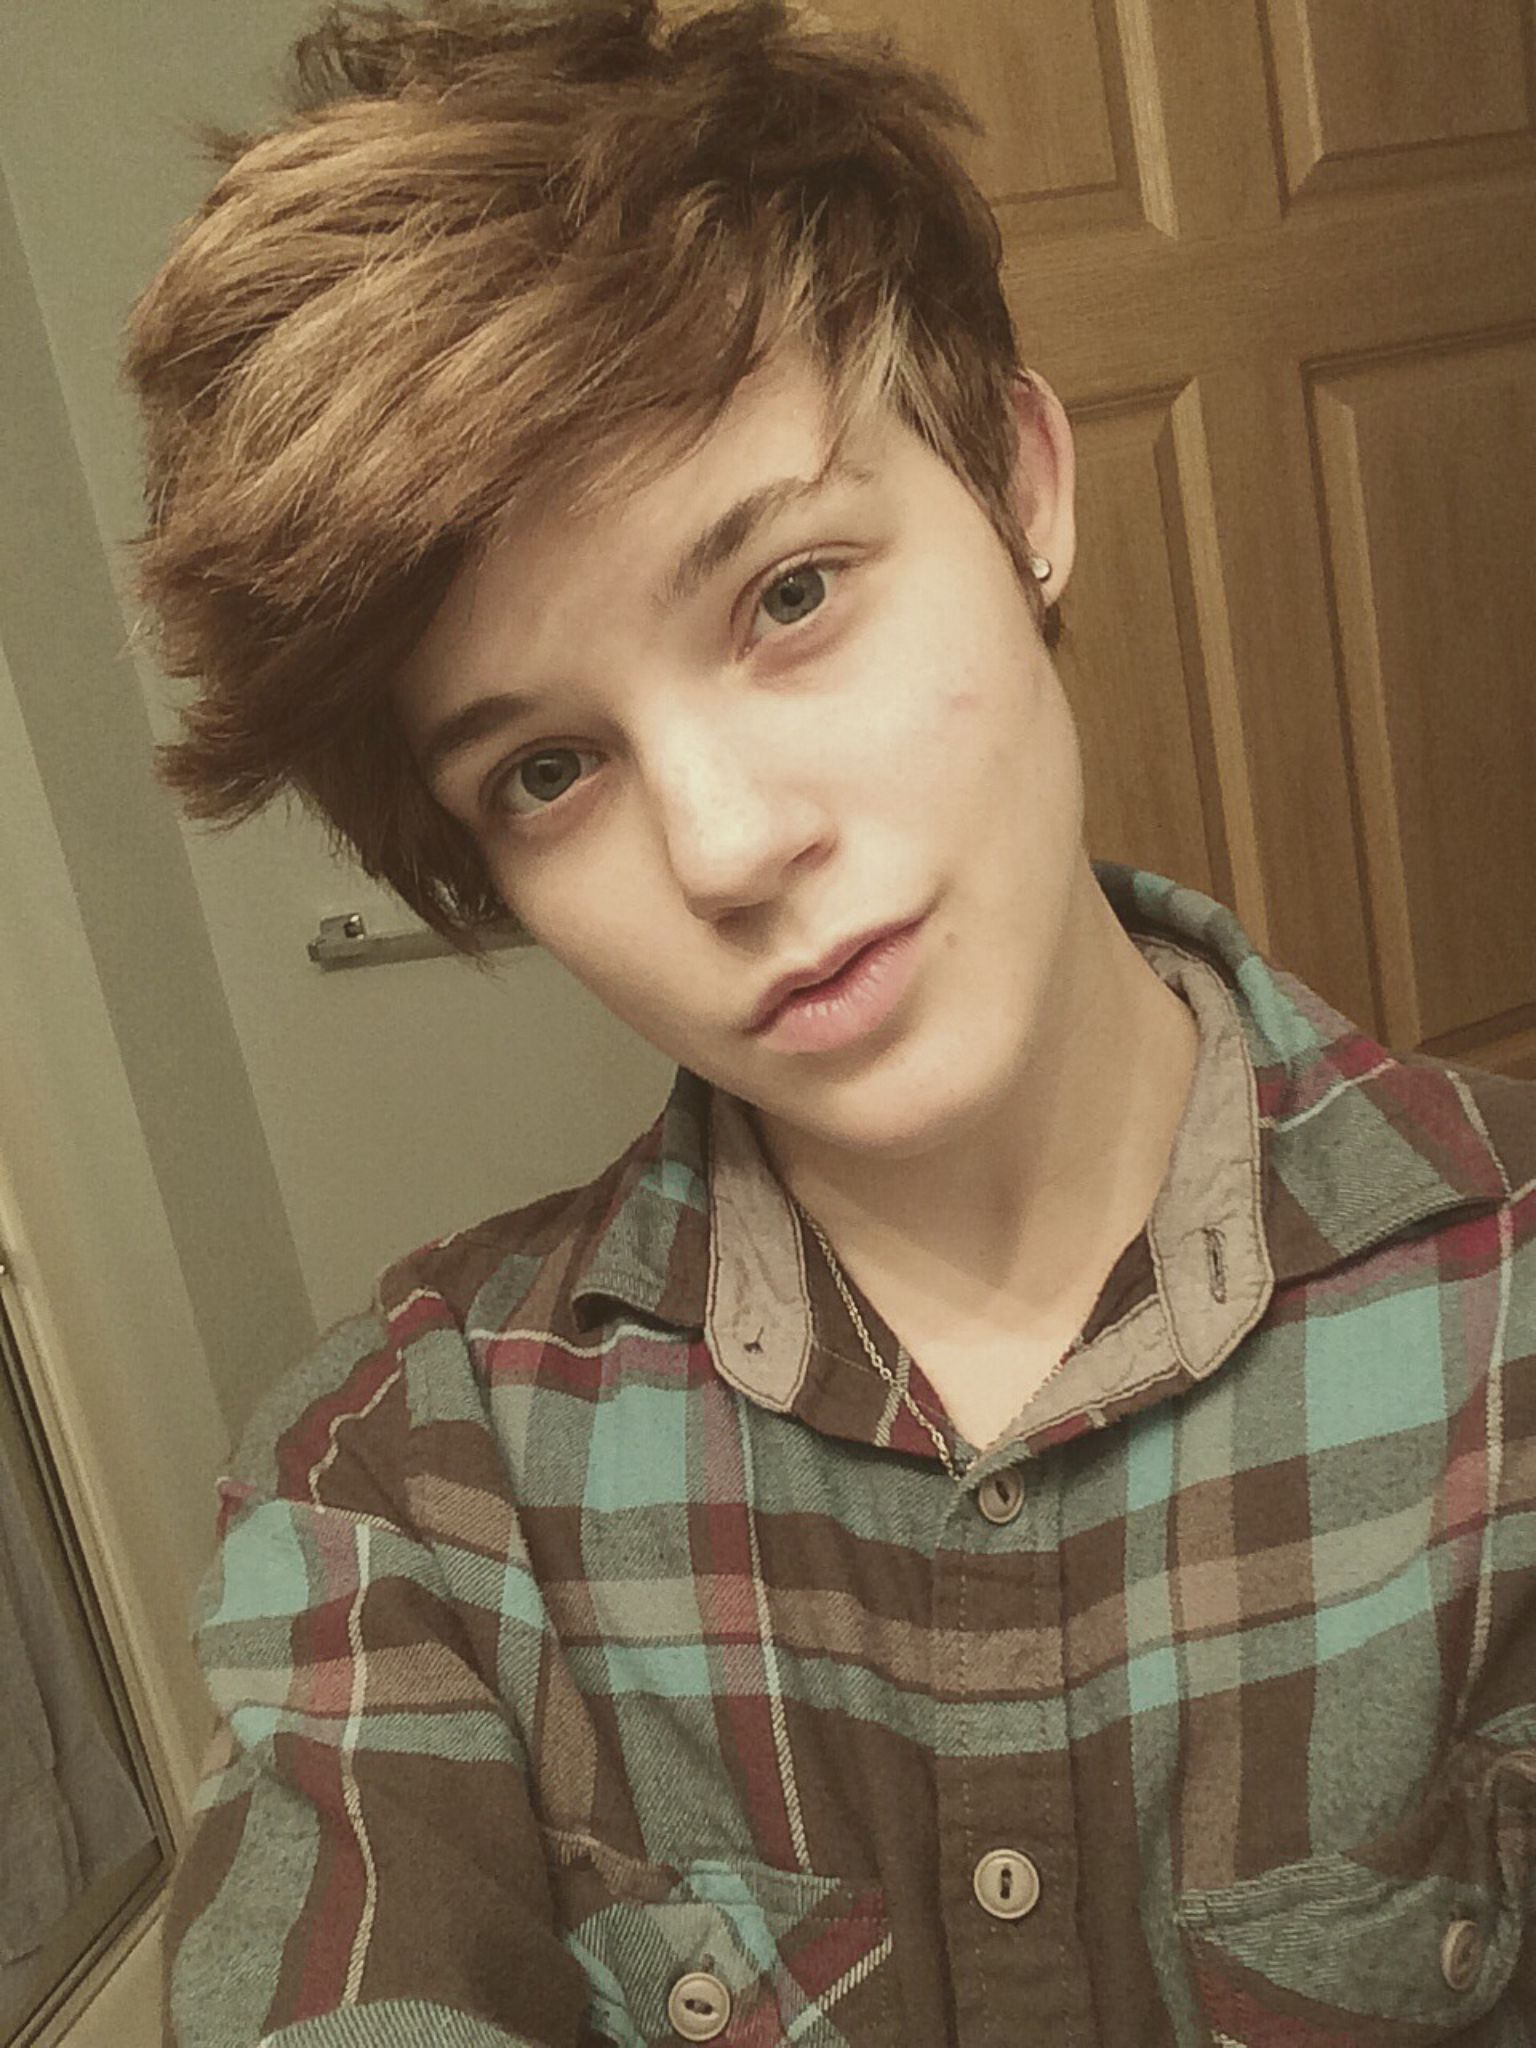 Cute And Boyish Hairstyles Pinterest Haircuts And Tomboy